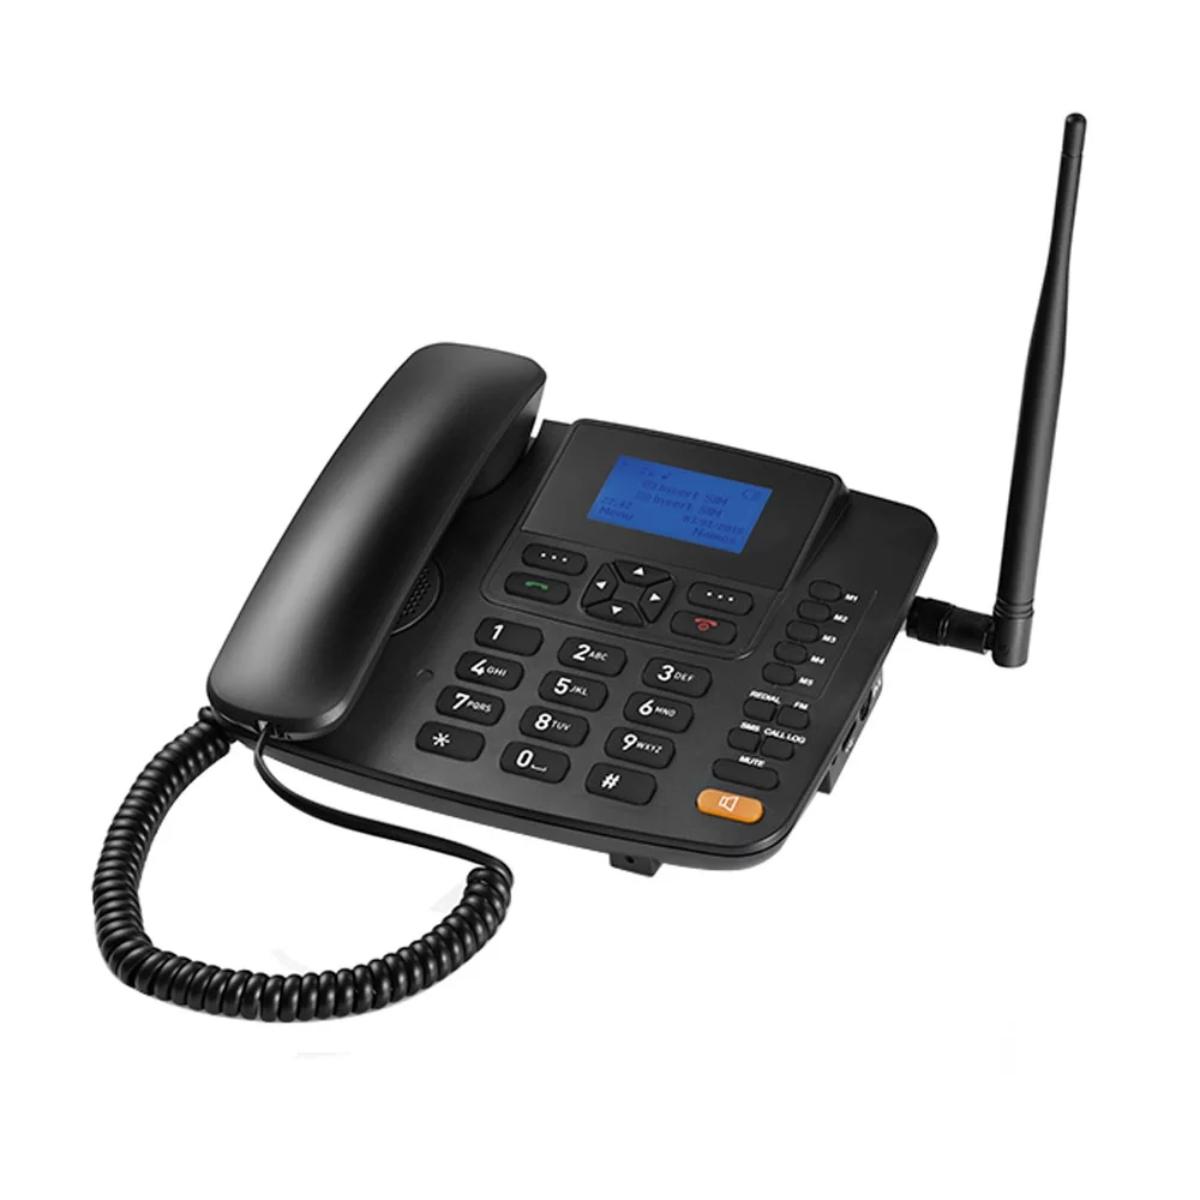 Telefone Rural Fixo De Mesa Quadriband 3g Multilaser Re504